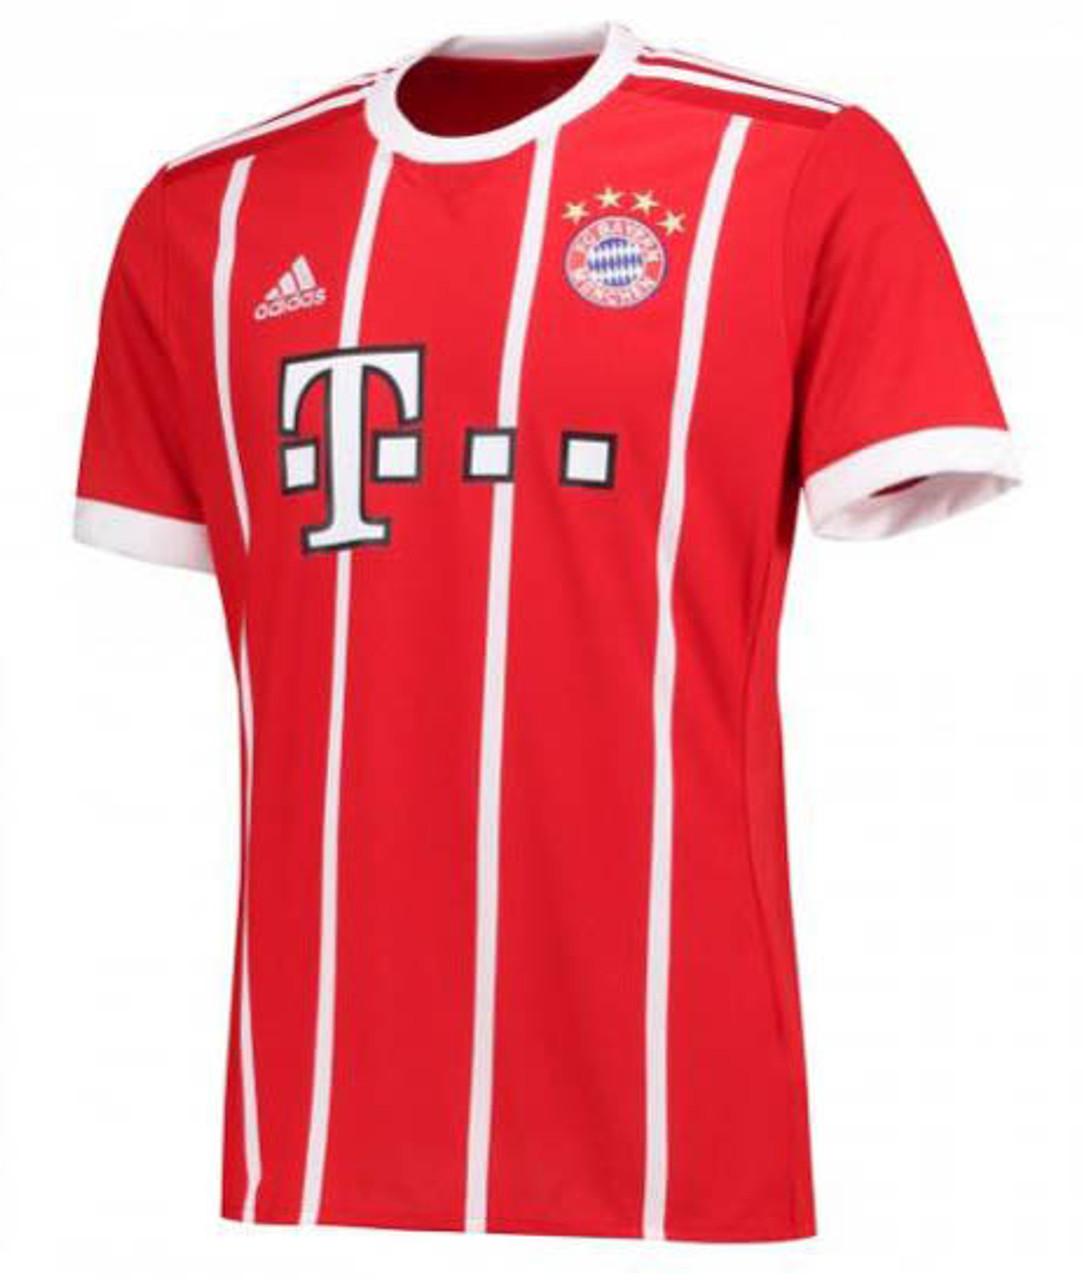 ade35c15a Adidas Bayern Munich 2017-2018 Home Jersey - True Red White (050519) - ohp  soccer